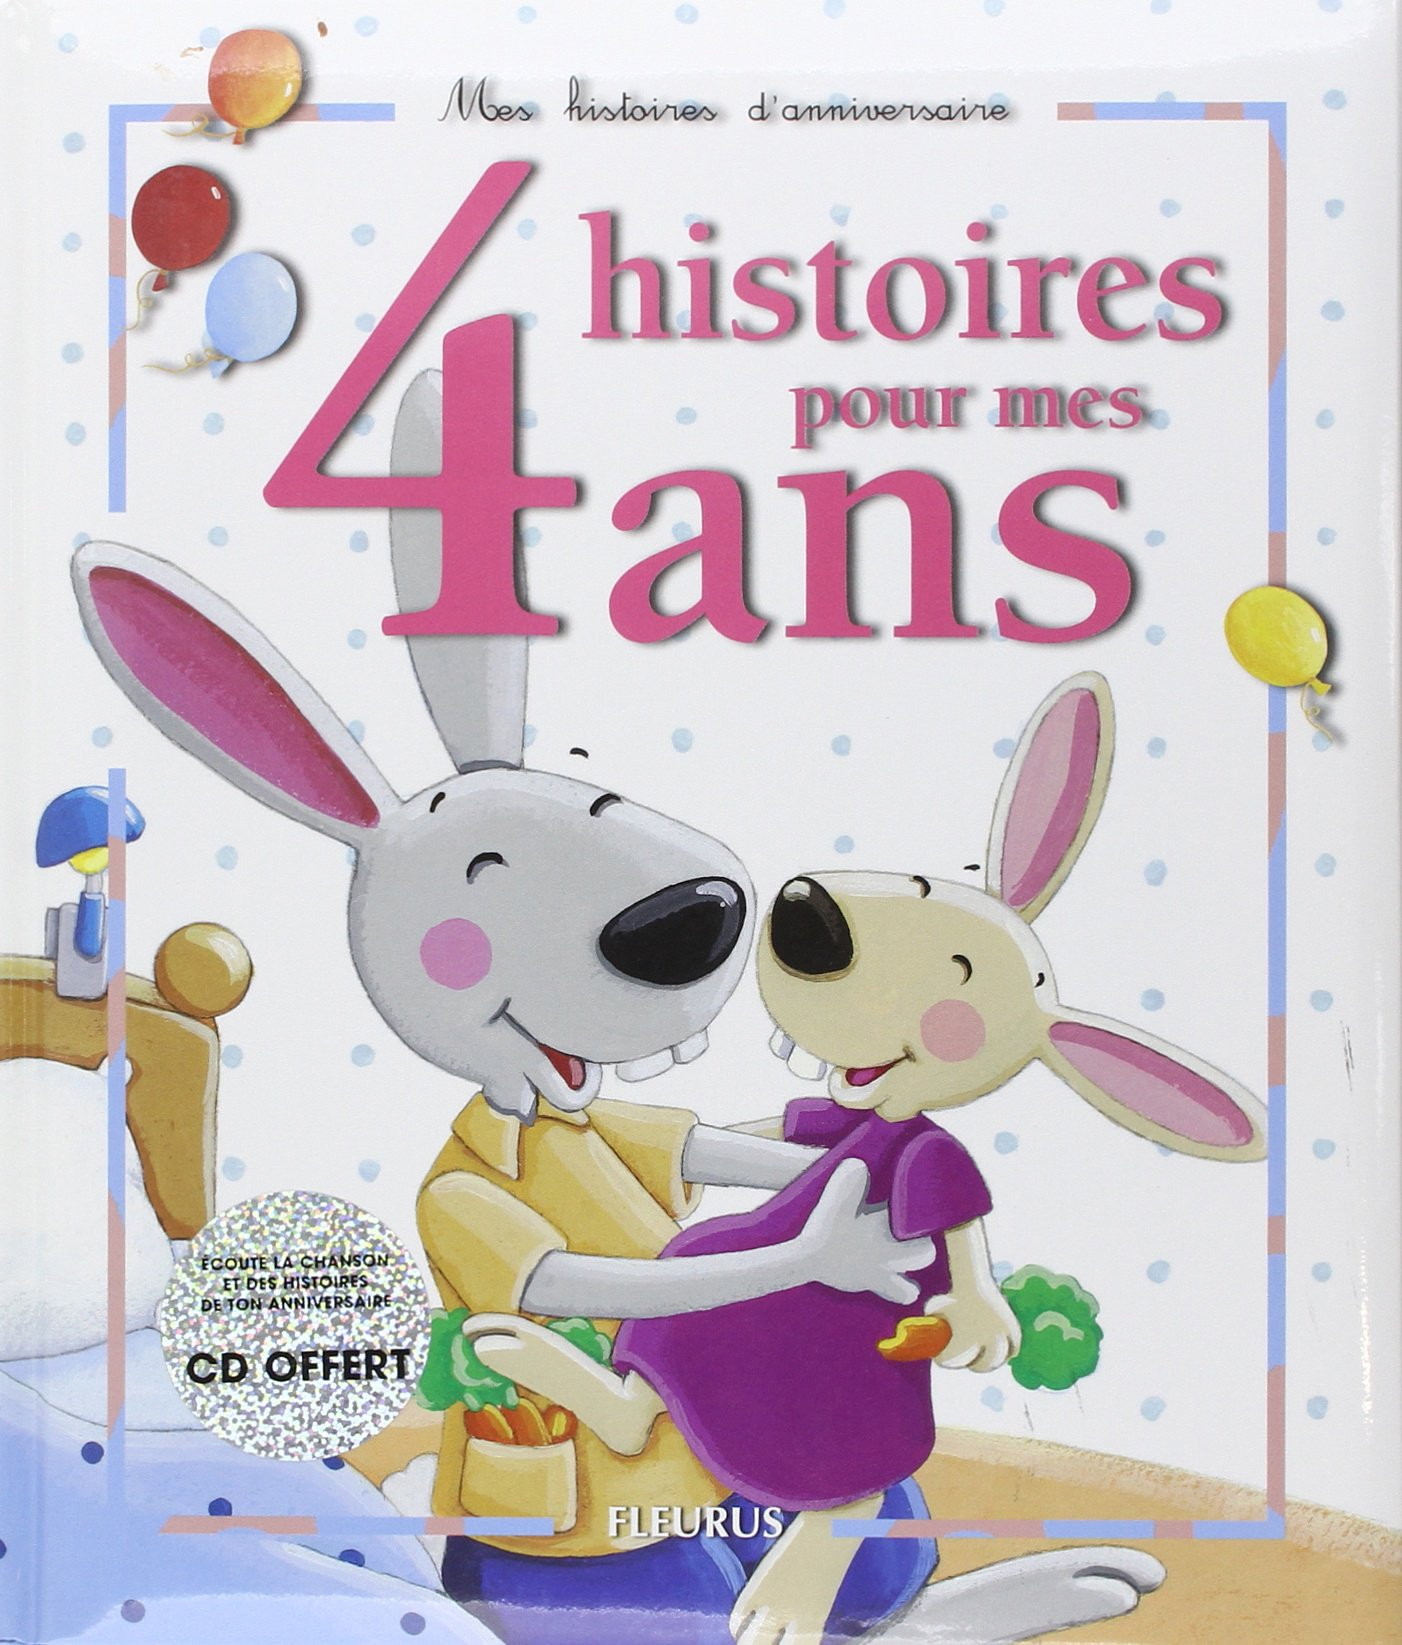 4 histoires pour mes 4 ans: Amazon ca: Collectif, Collectif